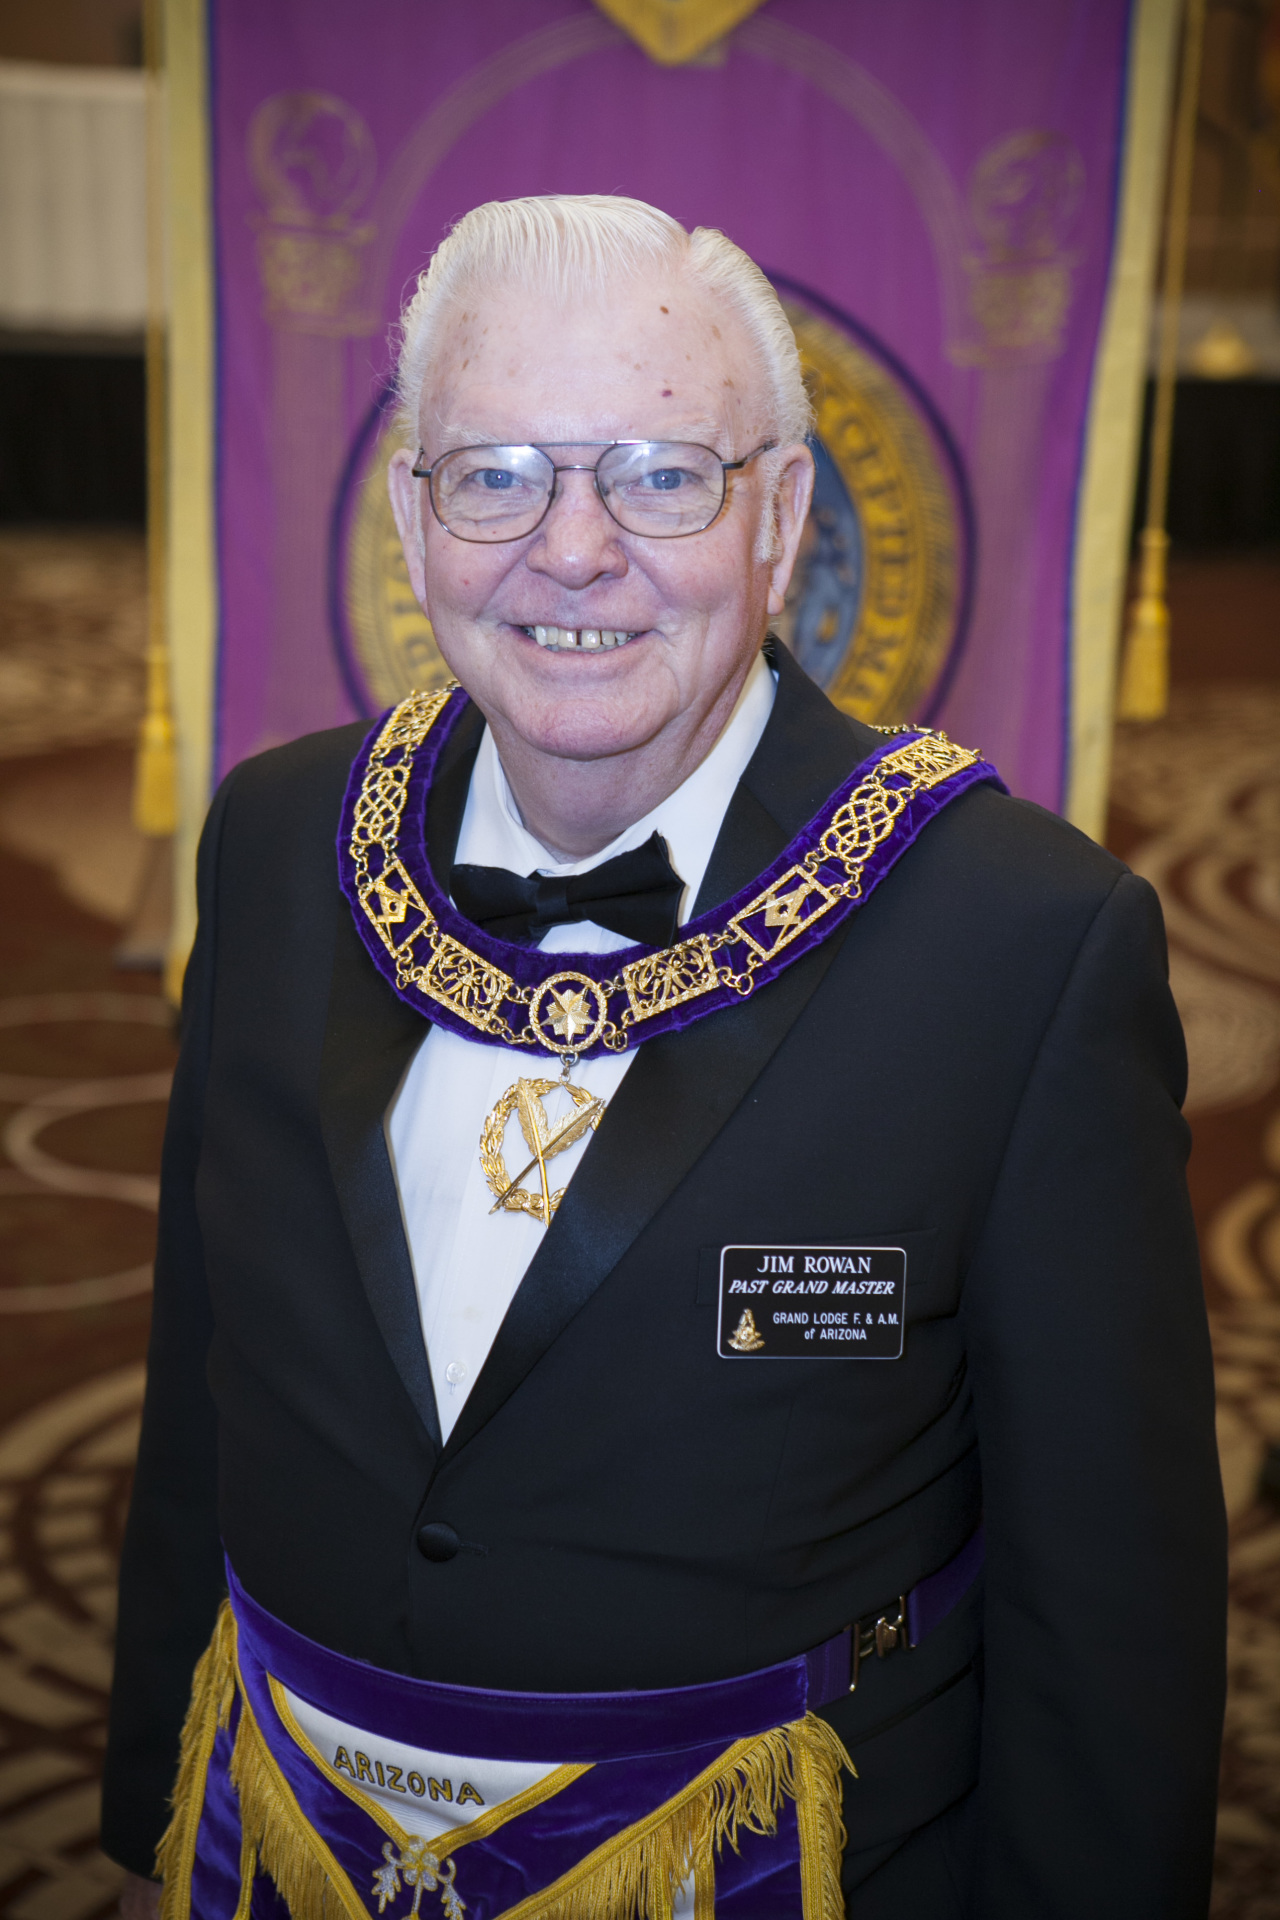 Jim Rowan